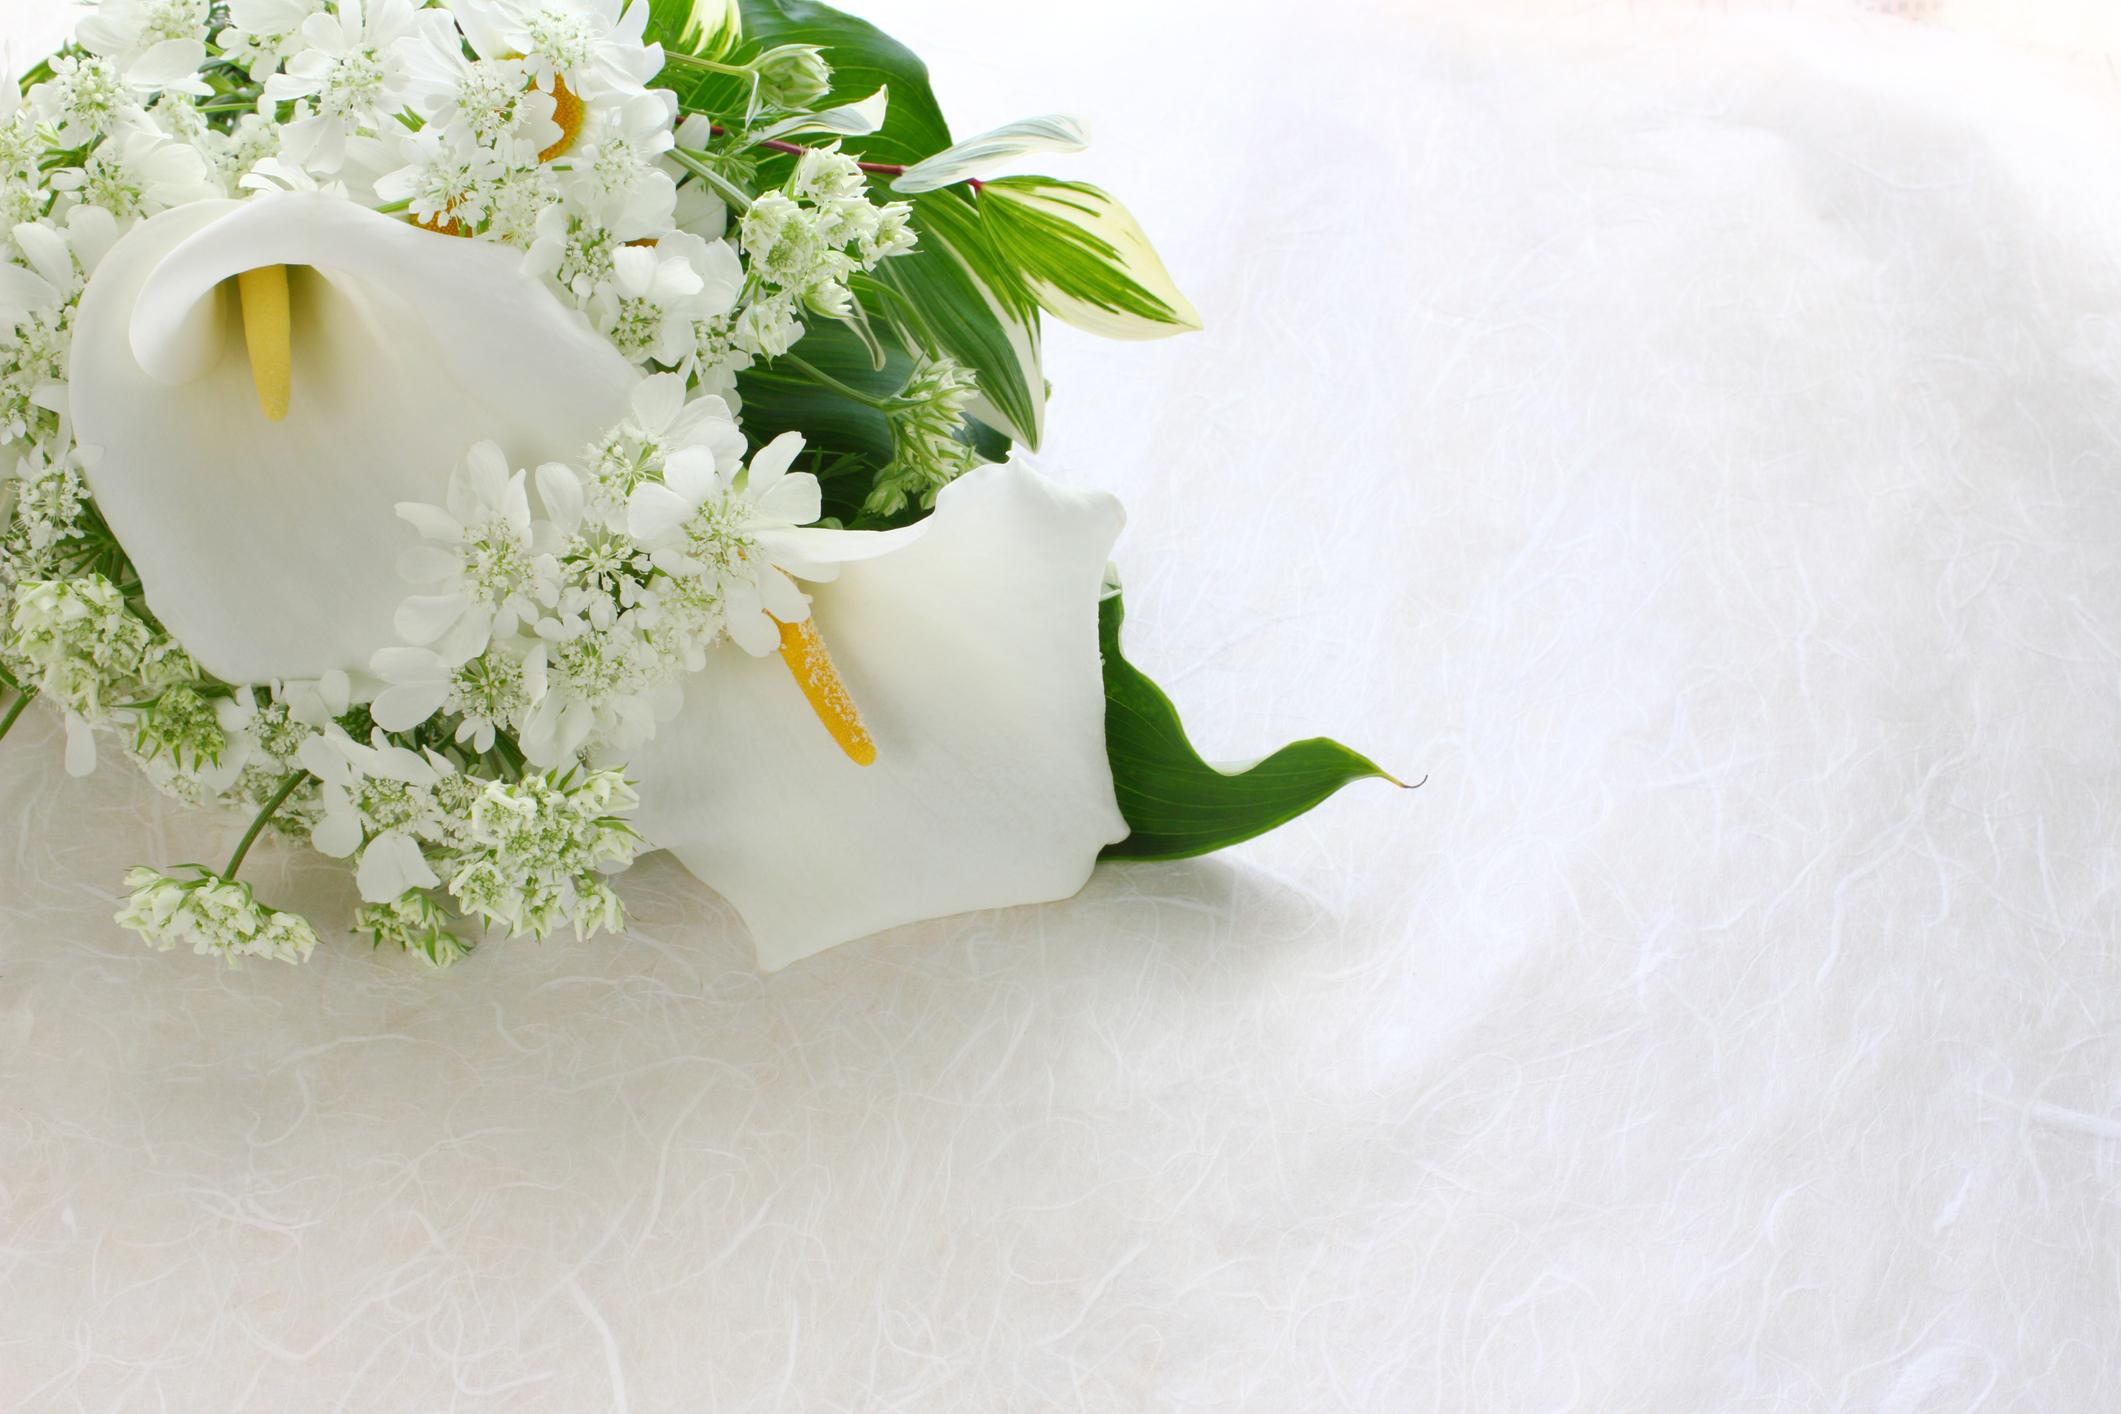 white flowers design animal crossing